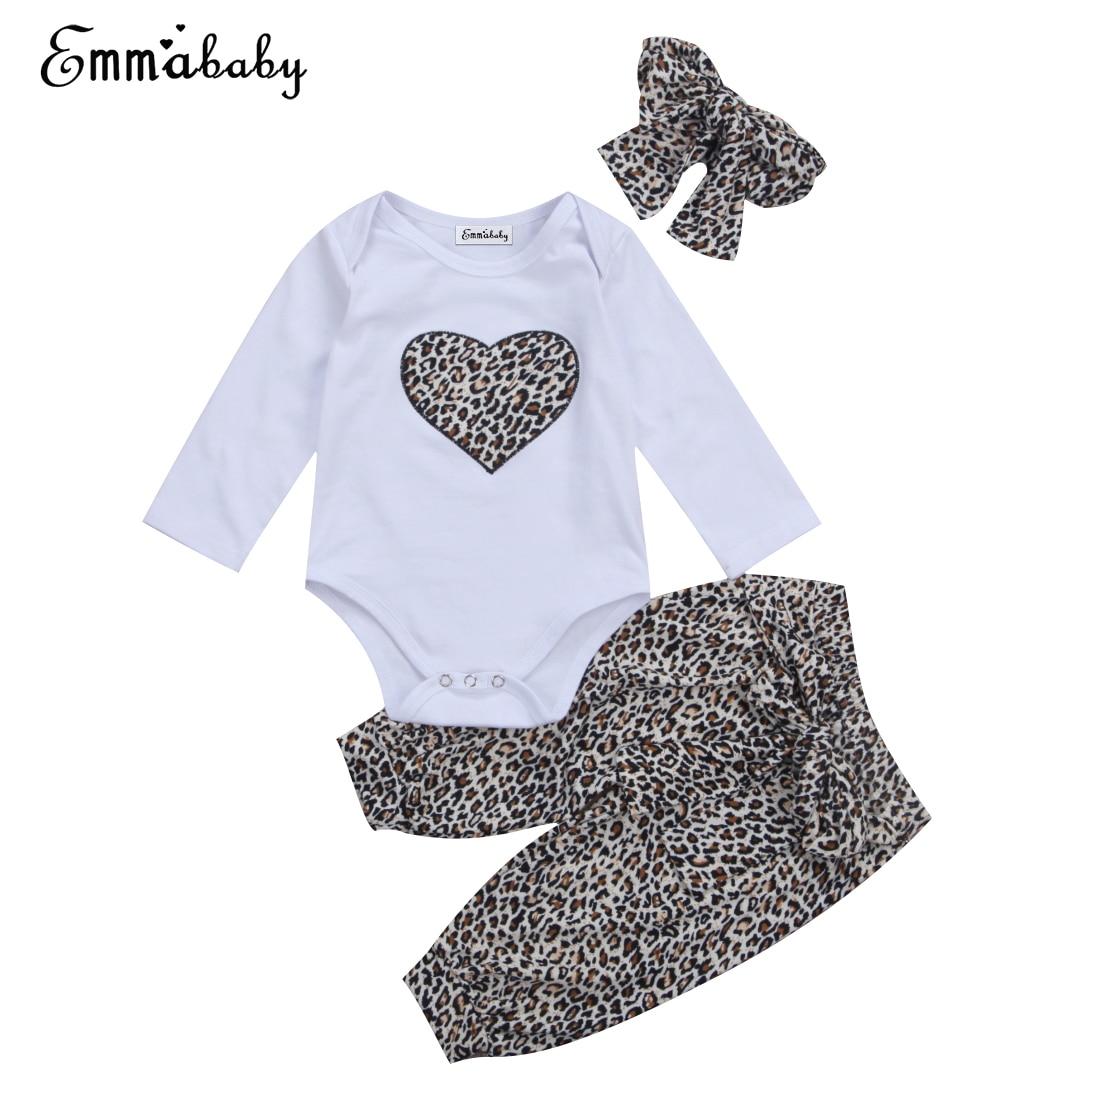 0-24M Cute Newborn Baby Kids Girls Clothes Set Leopard Heart Bodysuits Tops Long Pants Headband 3Pcs Cute Fashion Outfits Sets